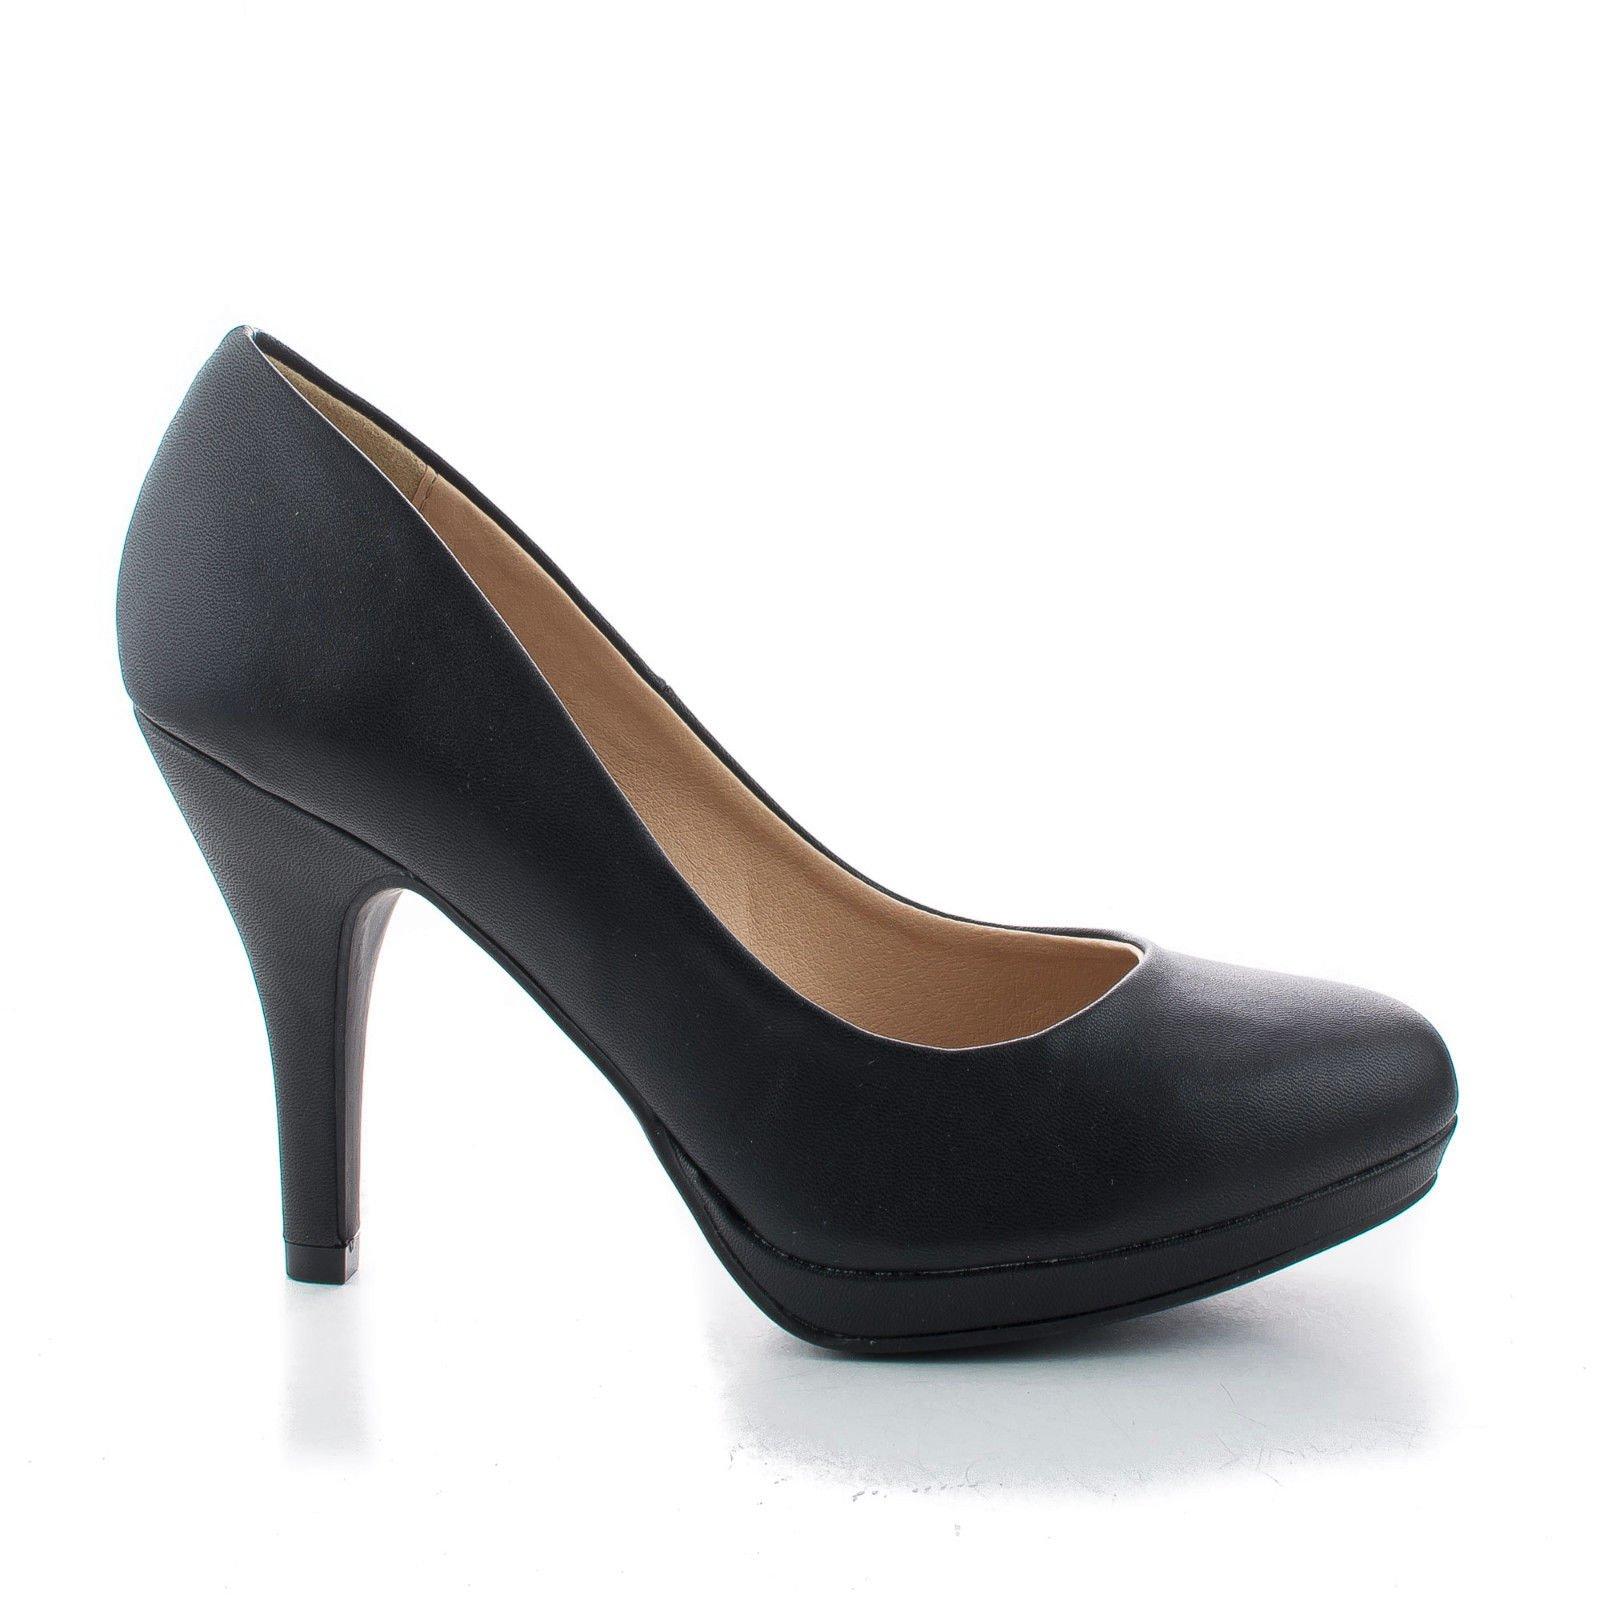 Round Toe Extra Cushioned Comfort Classic Dress Work Pumps (7 M US, Black Pu)